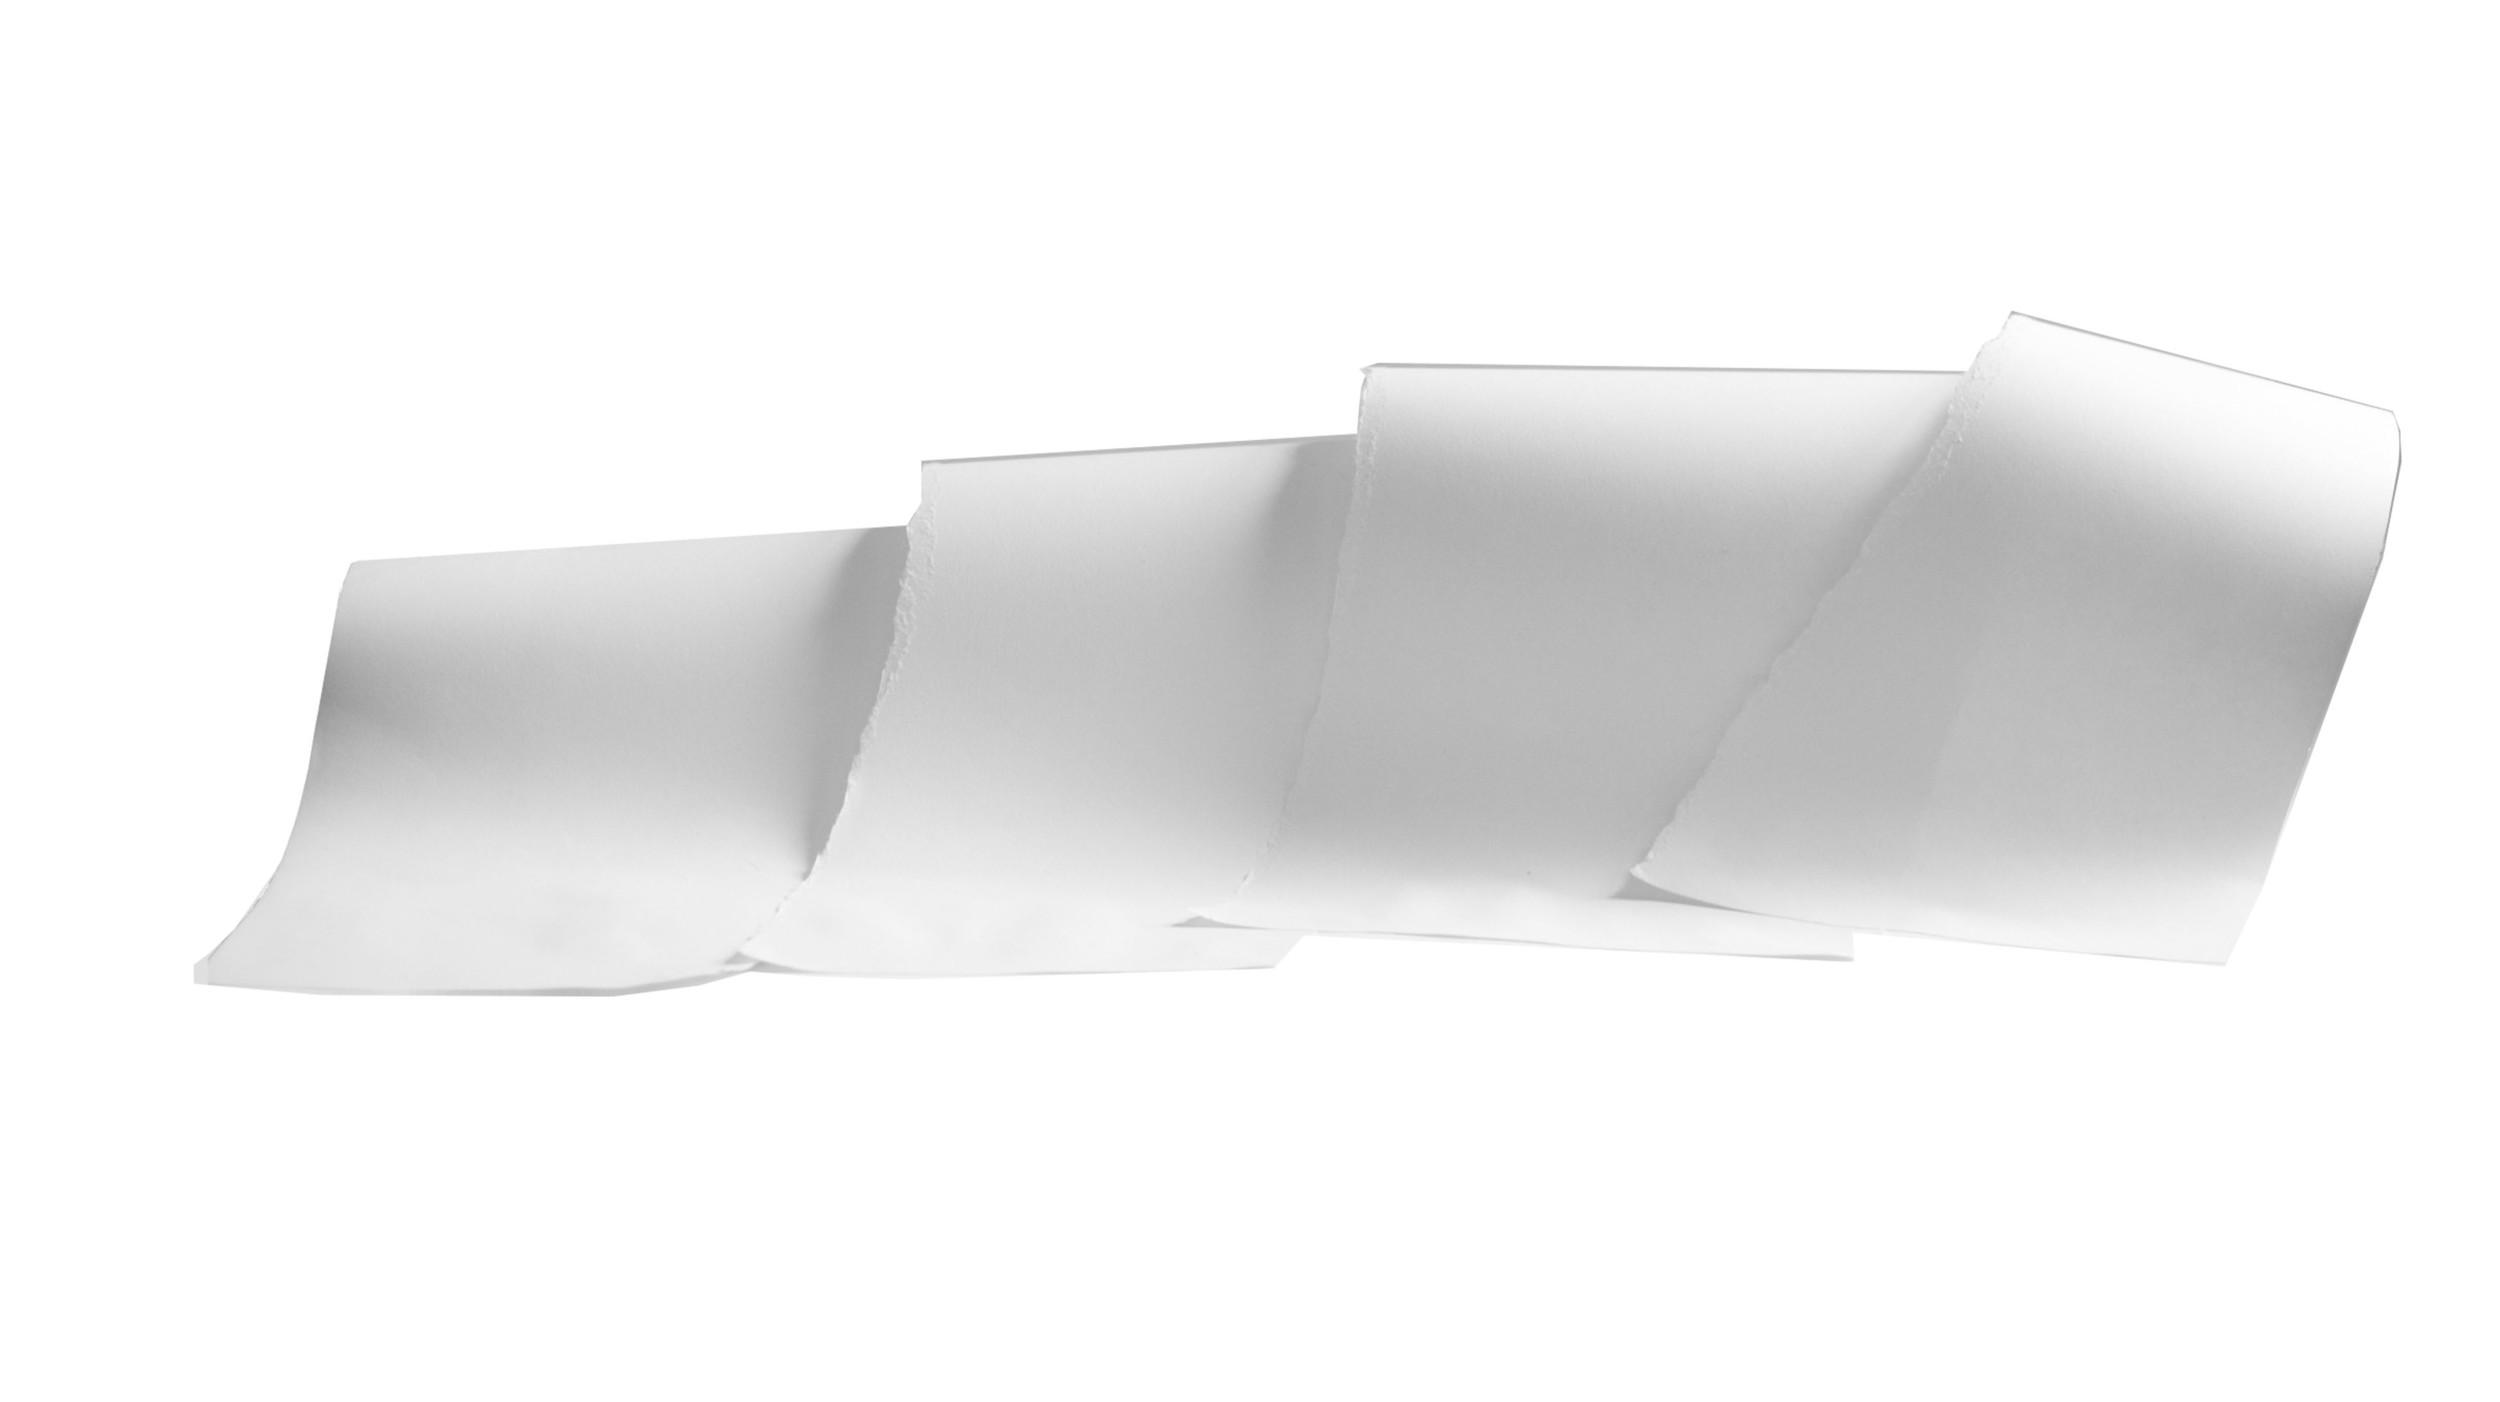 floating rolled paper w.b_allcut.jpg